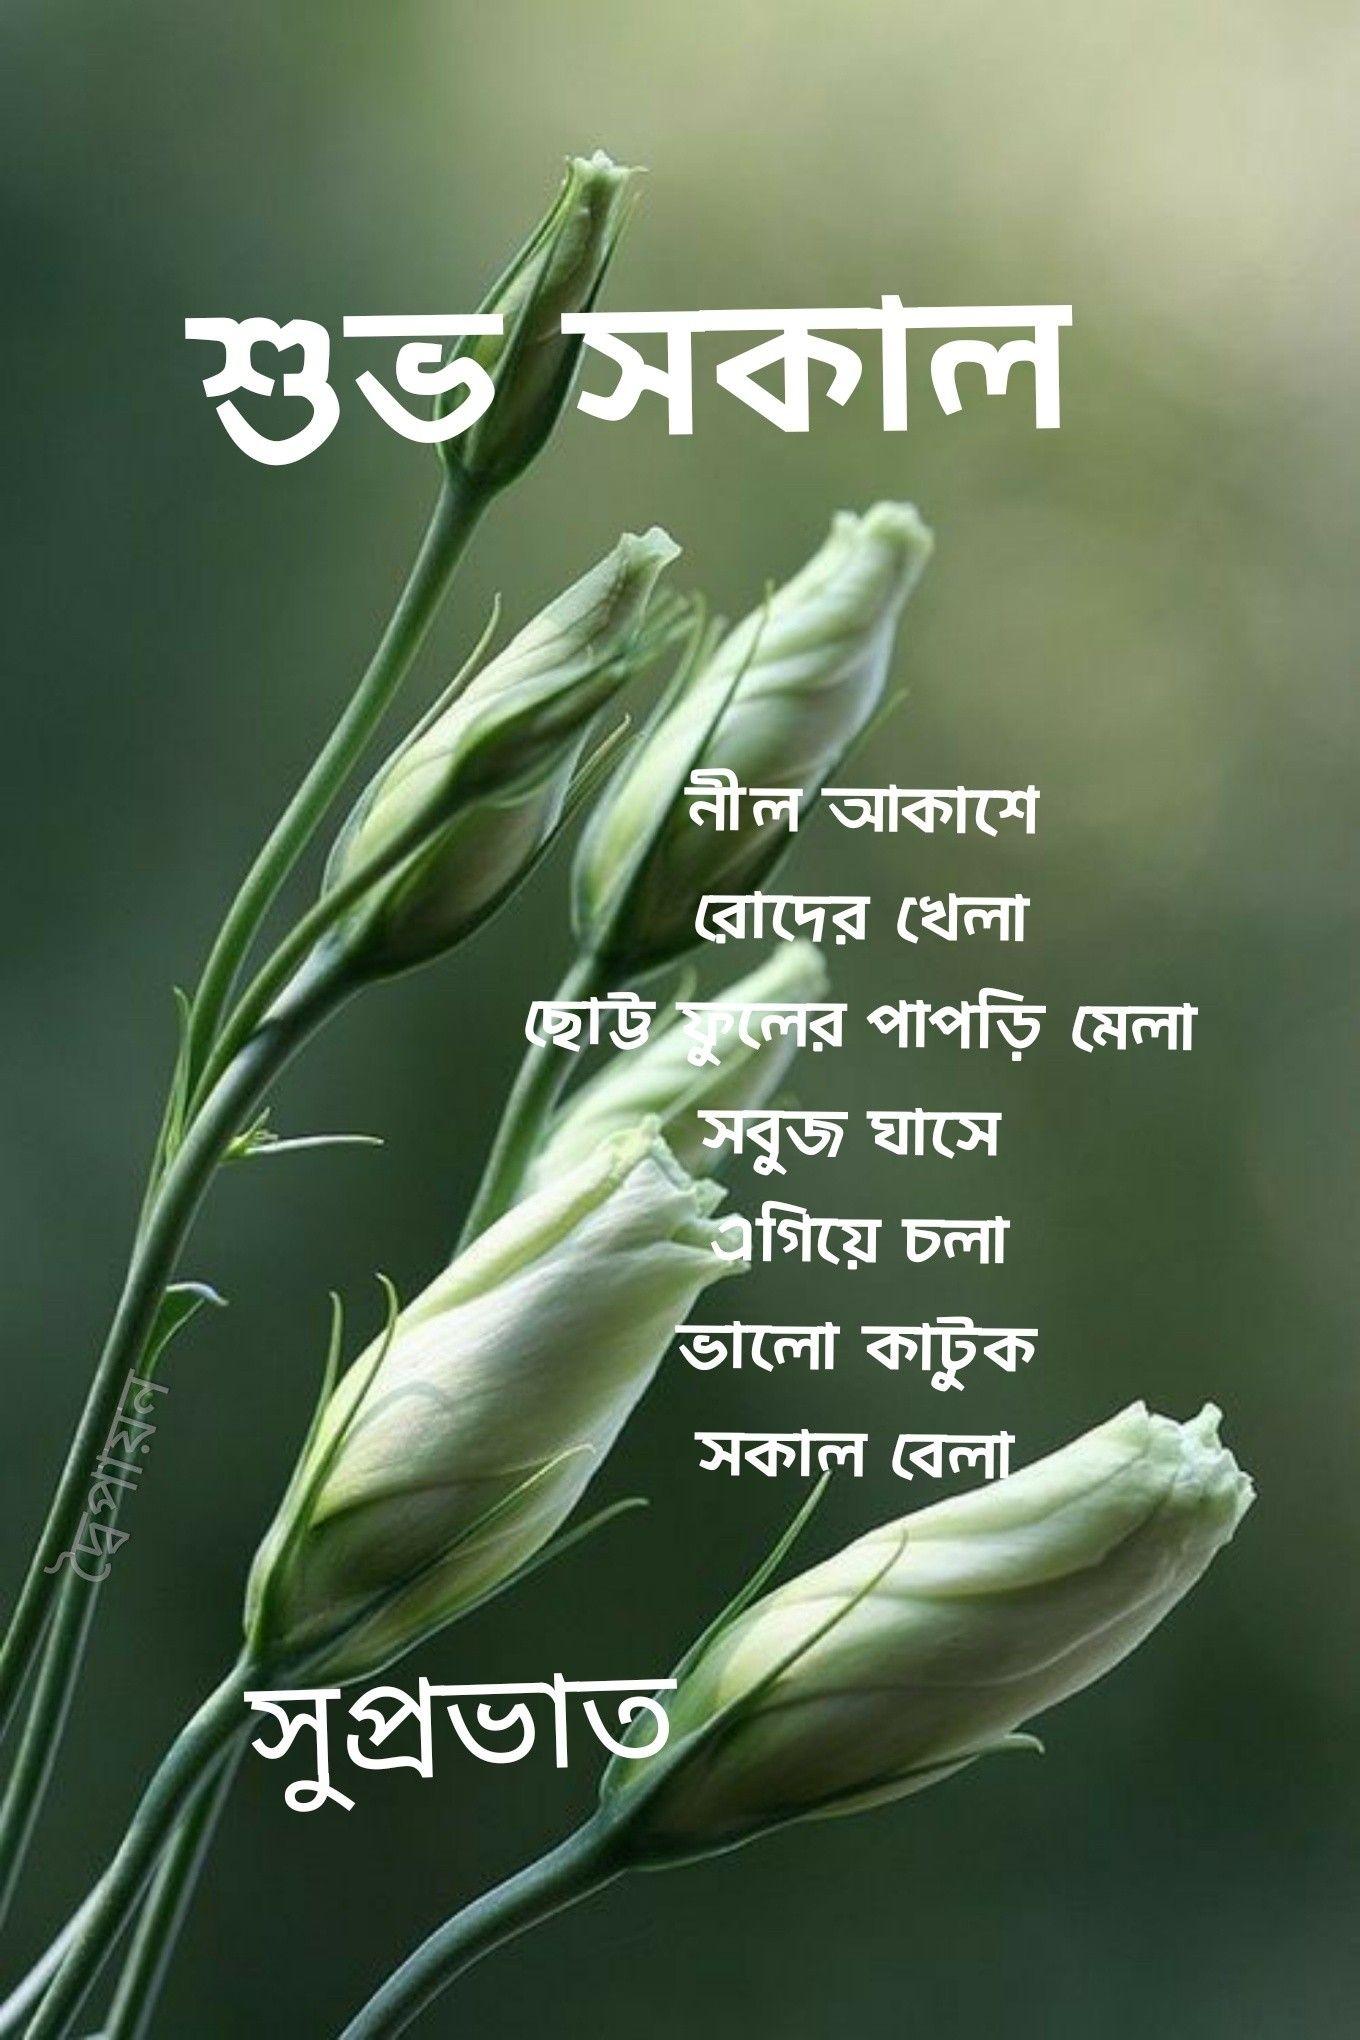 Suprbat   Good morning inspirational quotes, Good morning ...